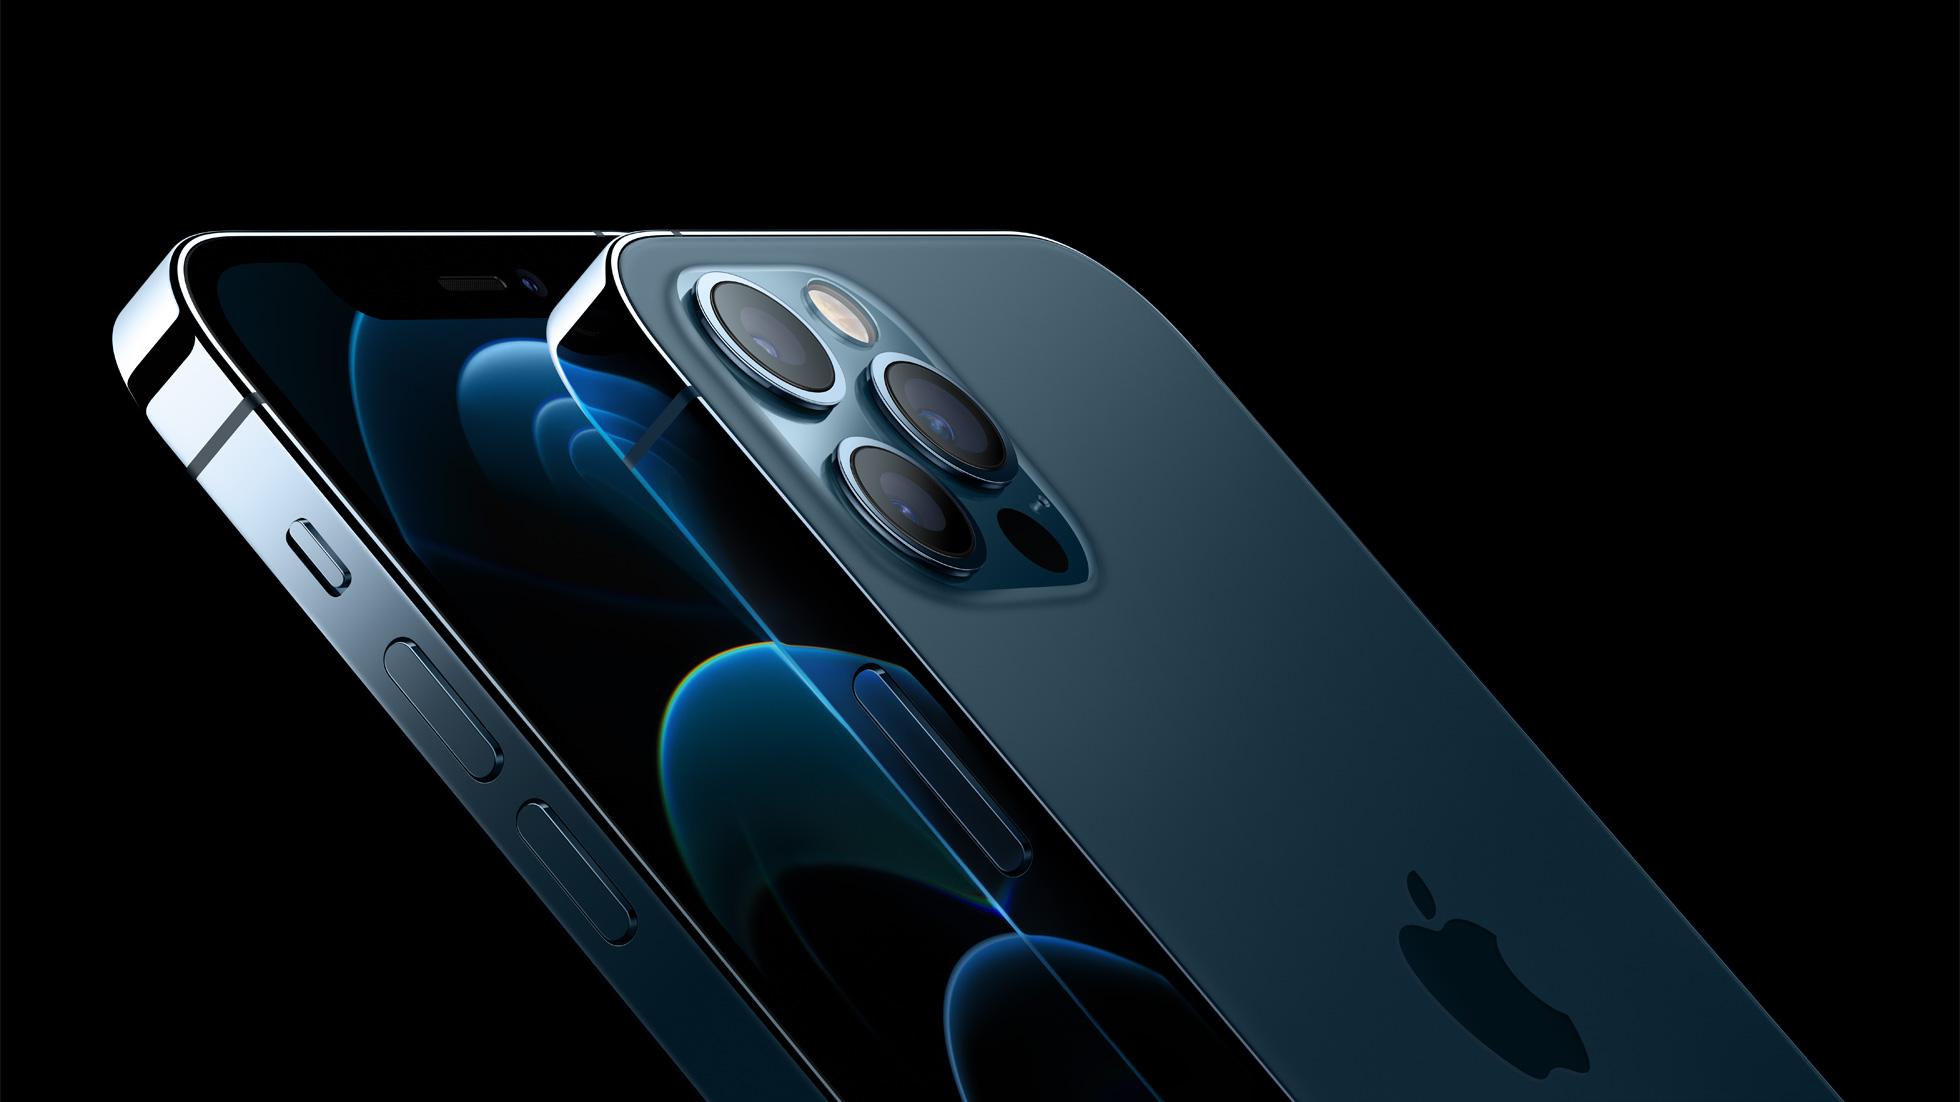 Apple компани iPhone 12, iPhone 12 Pro, iPhone 12 Pro Max, iPhone 12 mini ухаалаг утас танилцууллаа (фото 10)